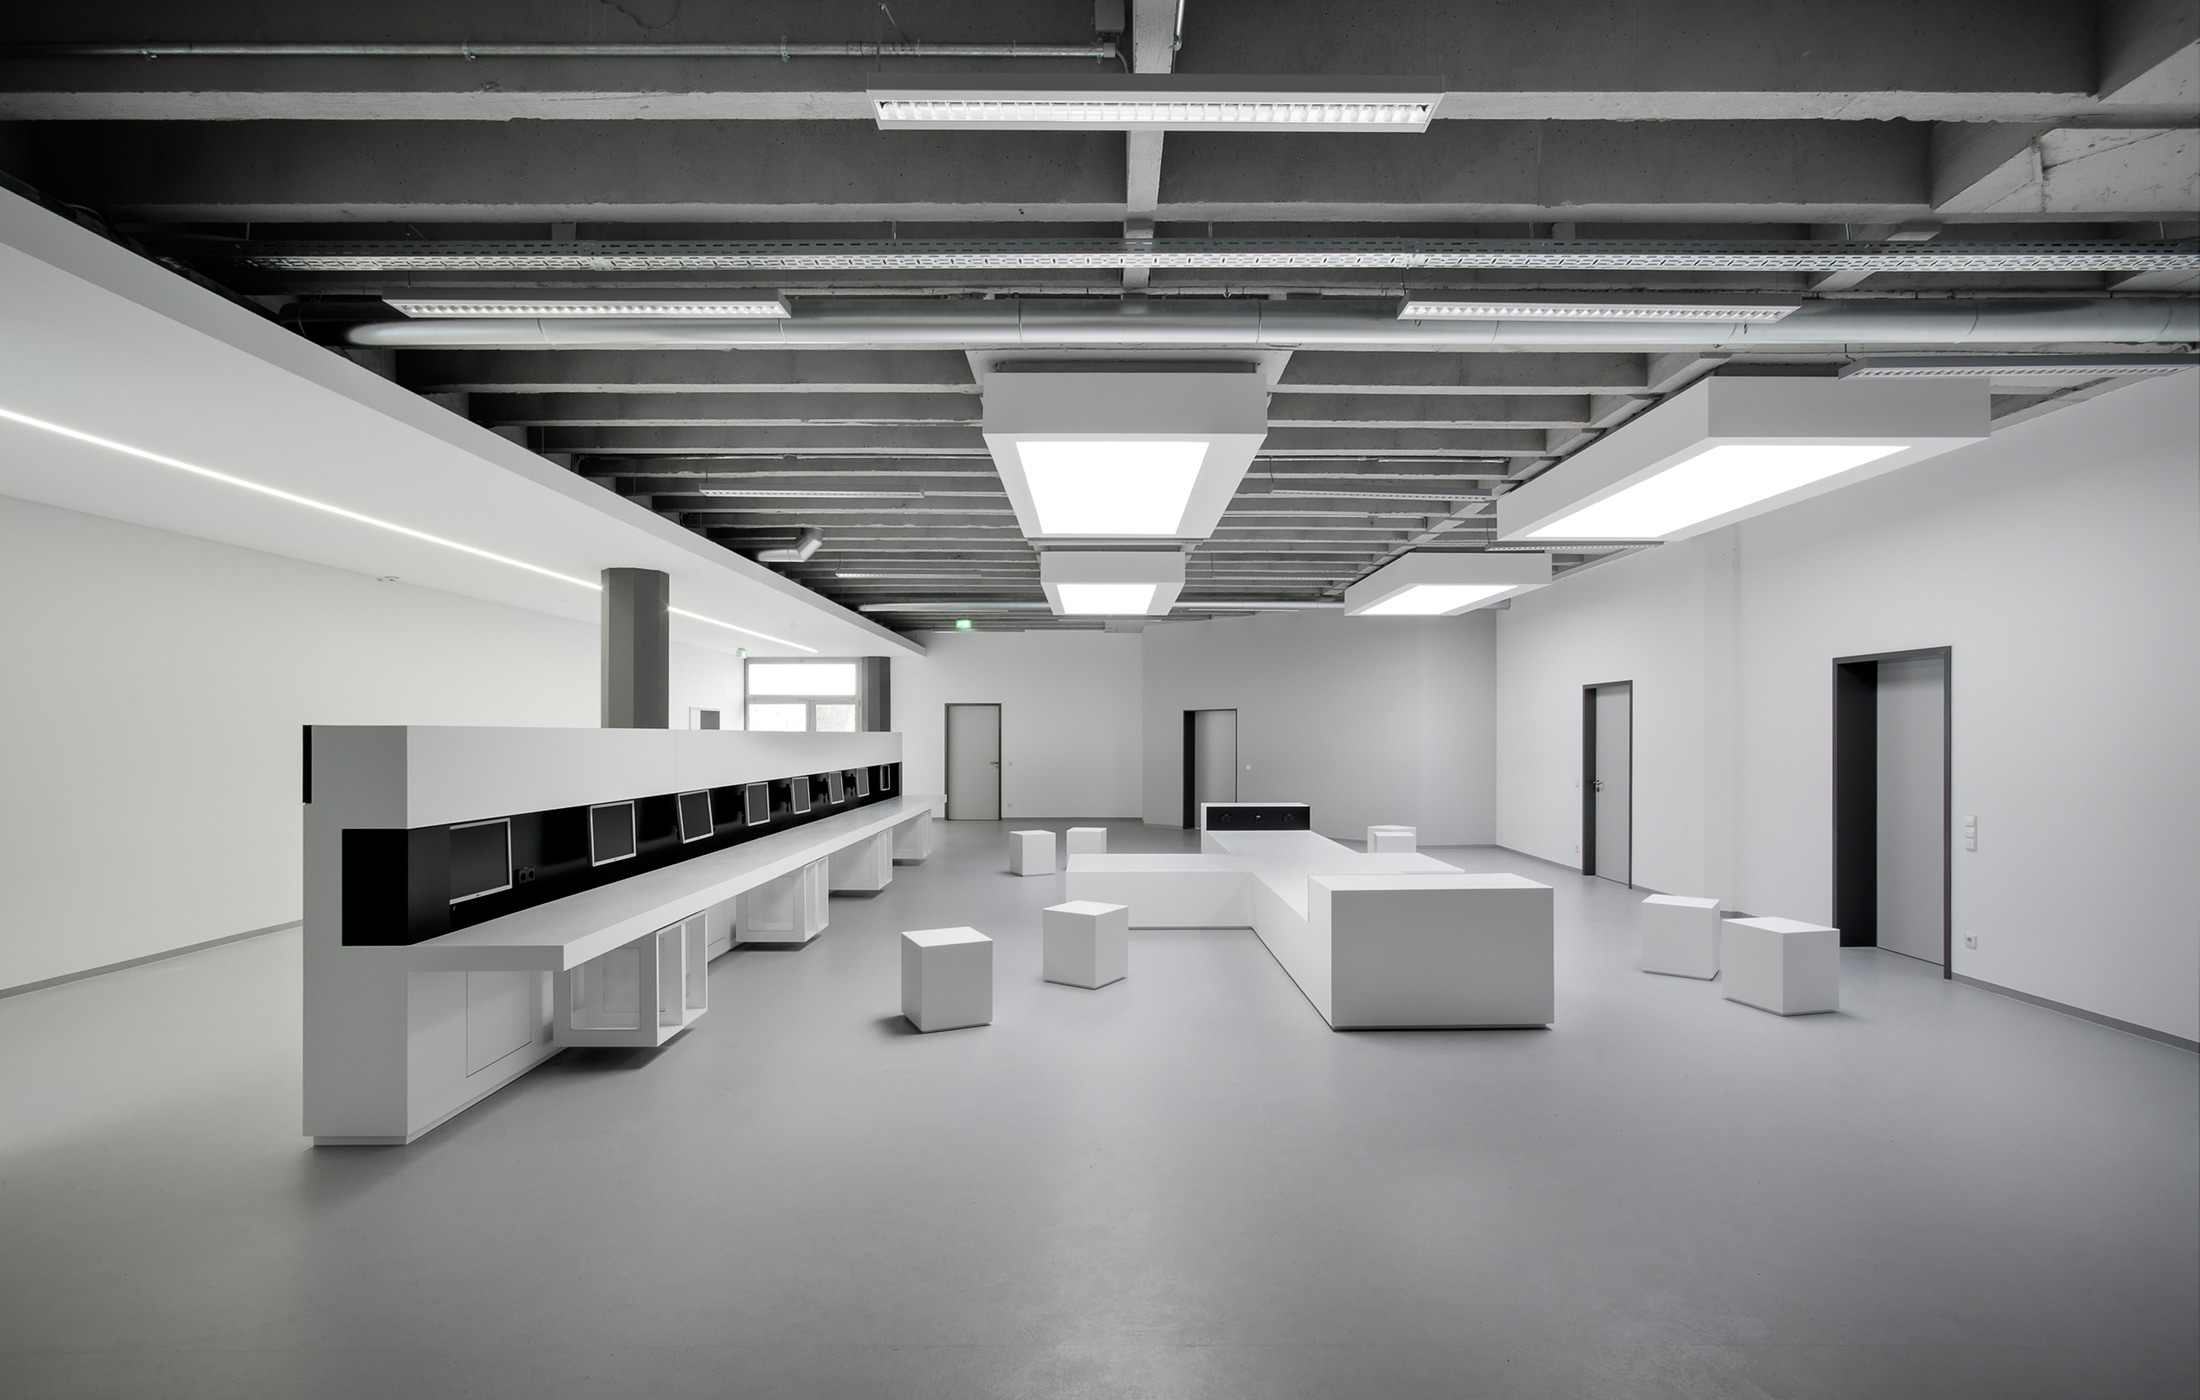 2013, Umbau DHBW am Standort der Diakonie Mosbach